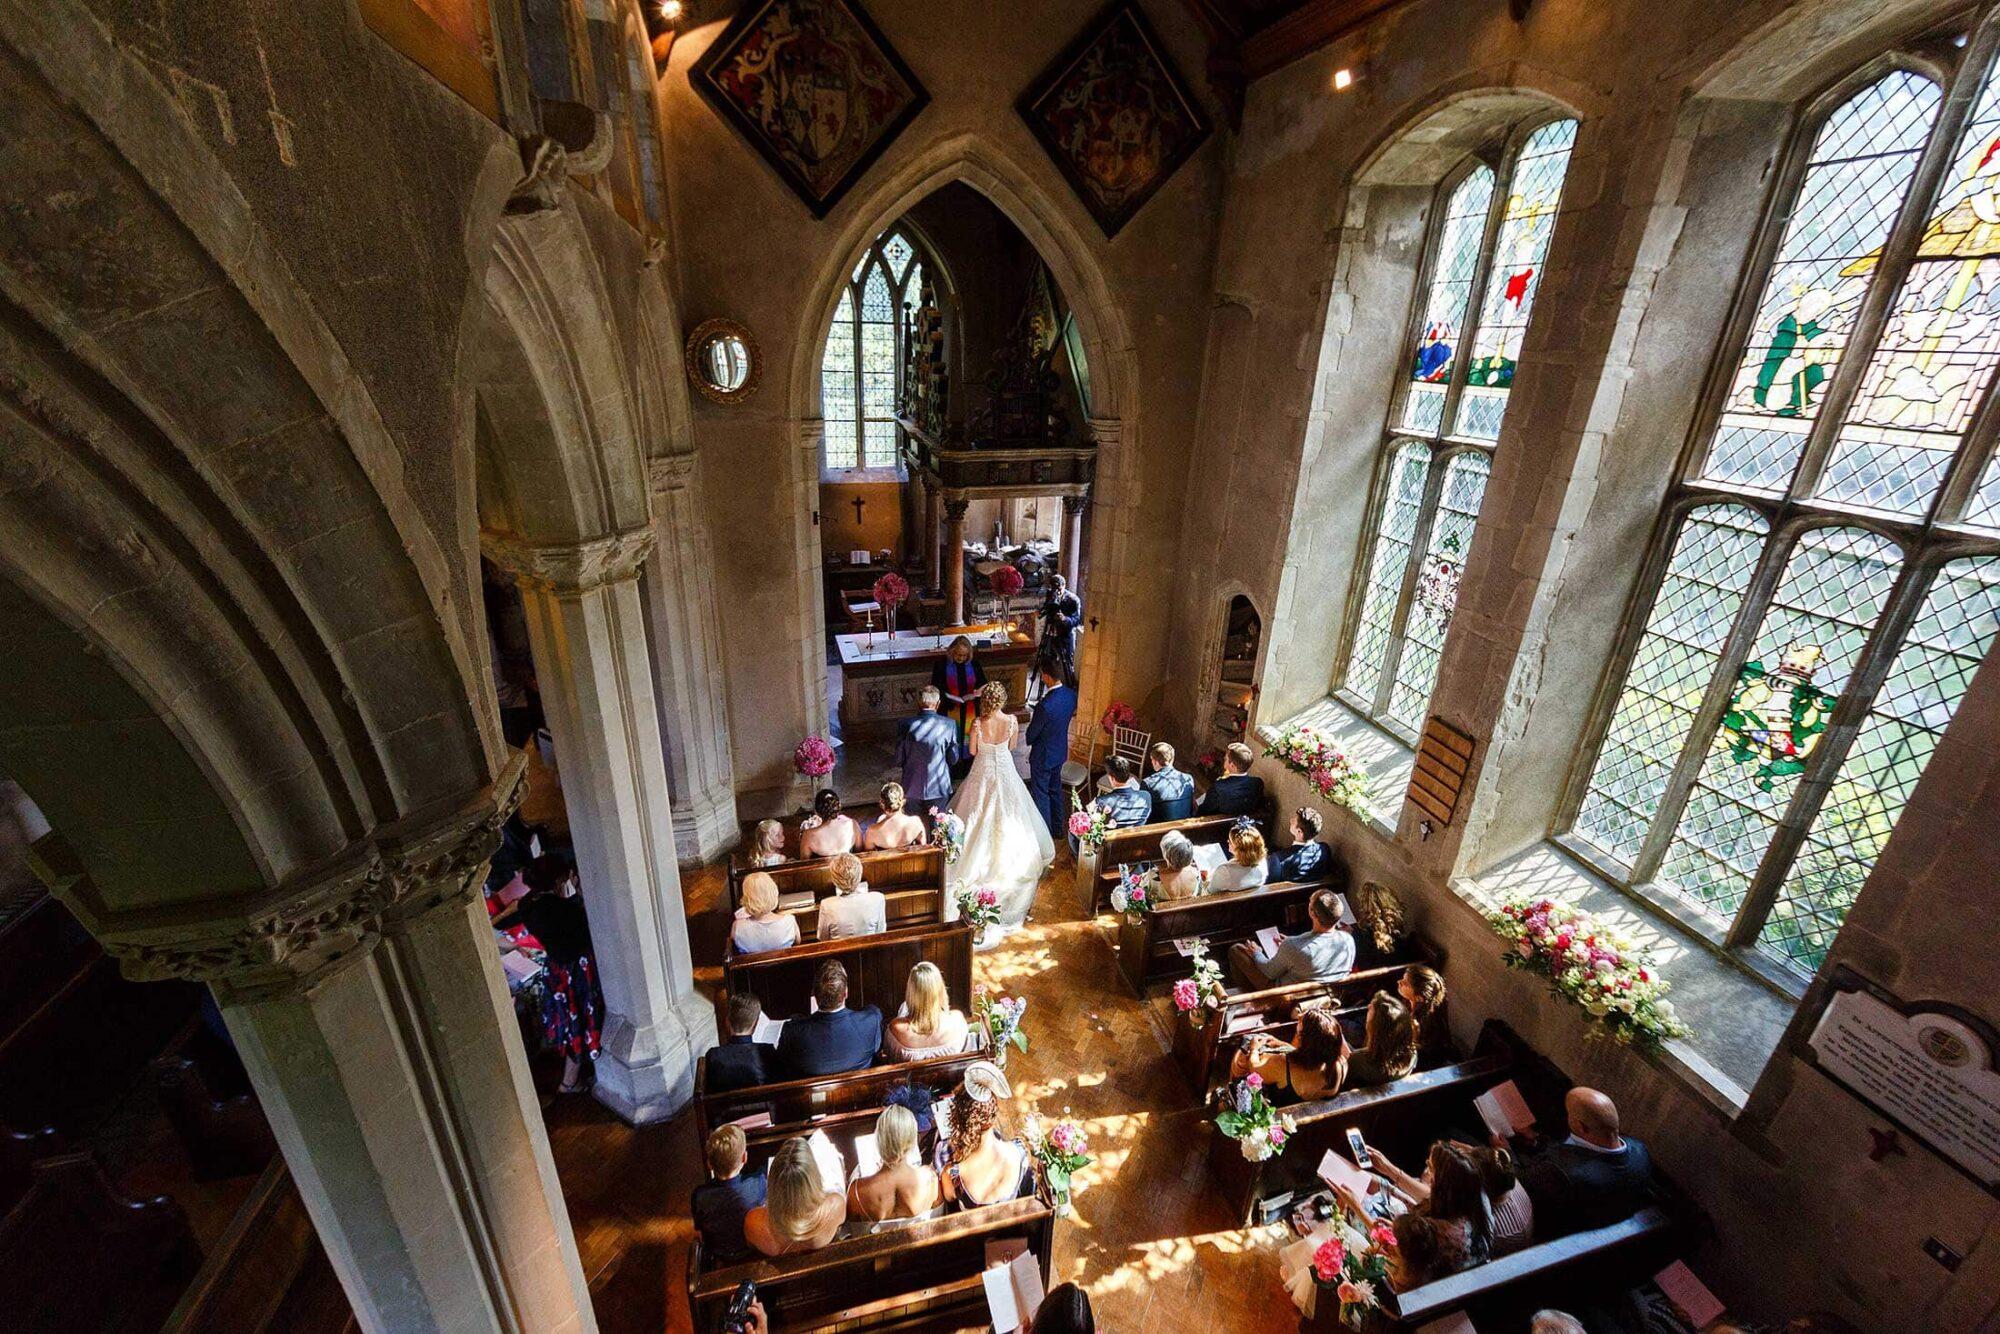 Caroline & Stephen's Hengrave wedding